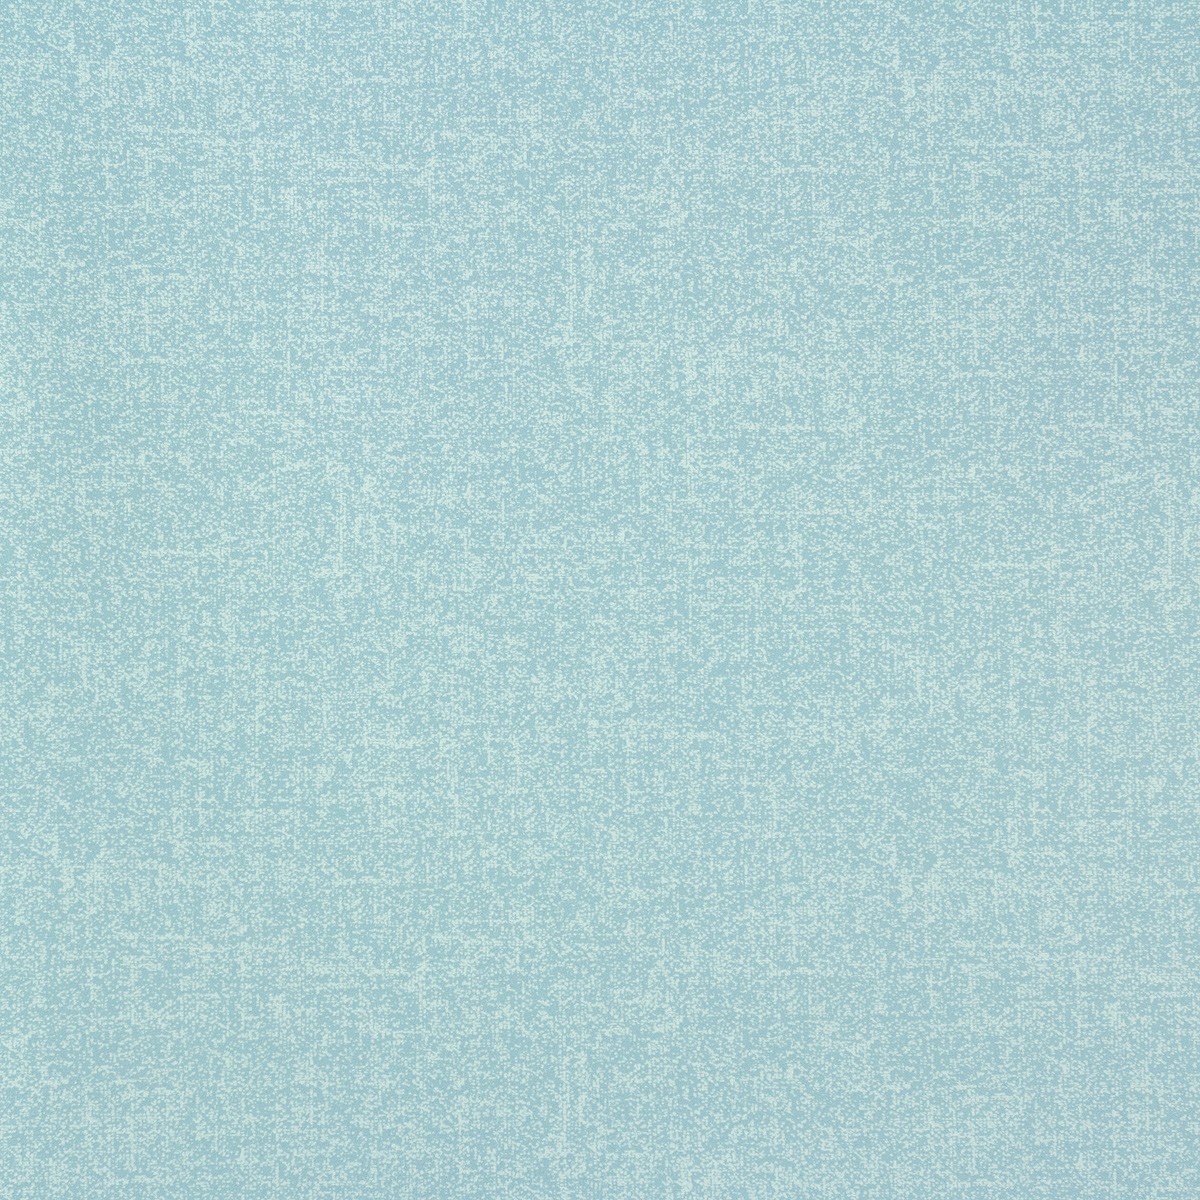 Rasch textil tapete uni hellblau tapeten new age 320168 for Tapete hellblau